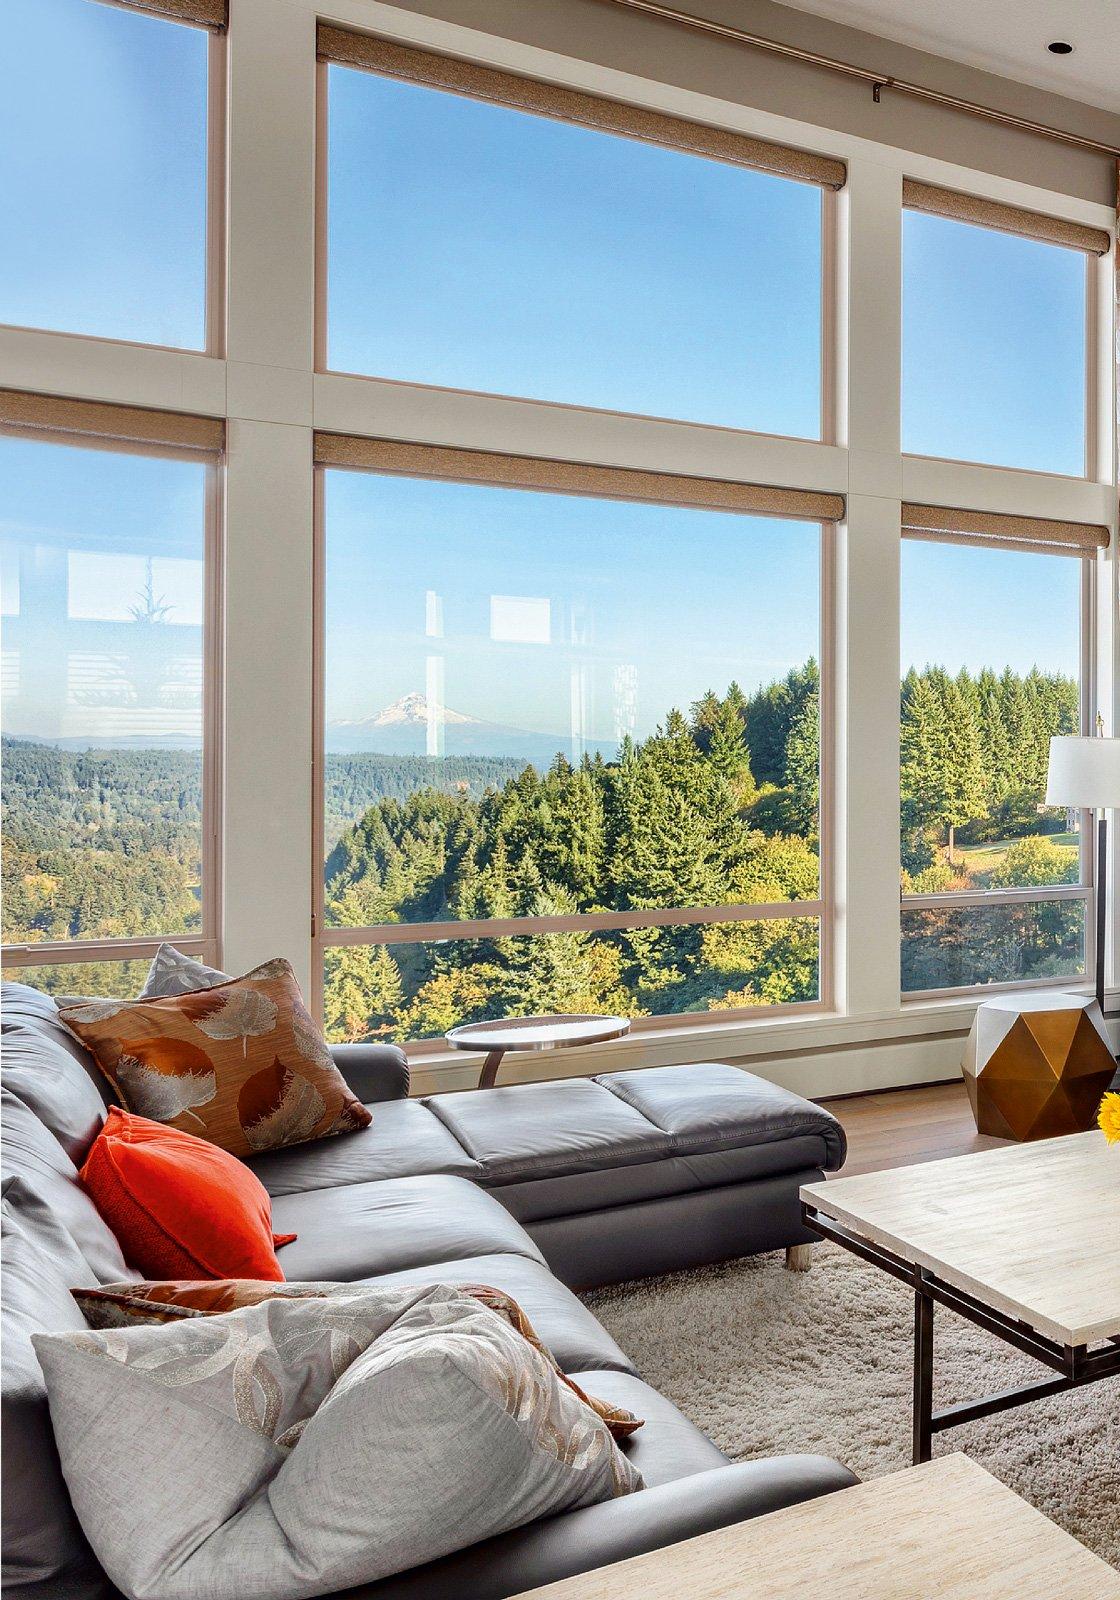 Casa incentivi elegant fabulous affordable excellent for Incentivi mobili 2016